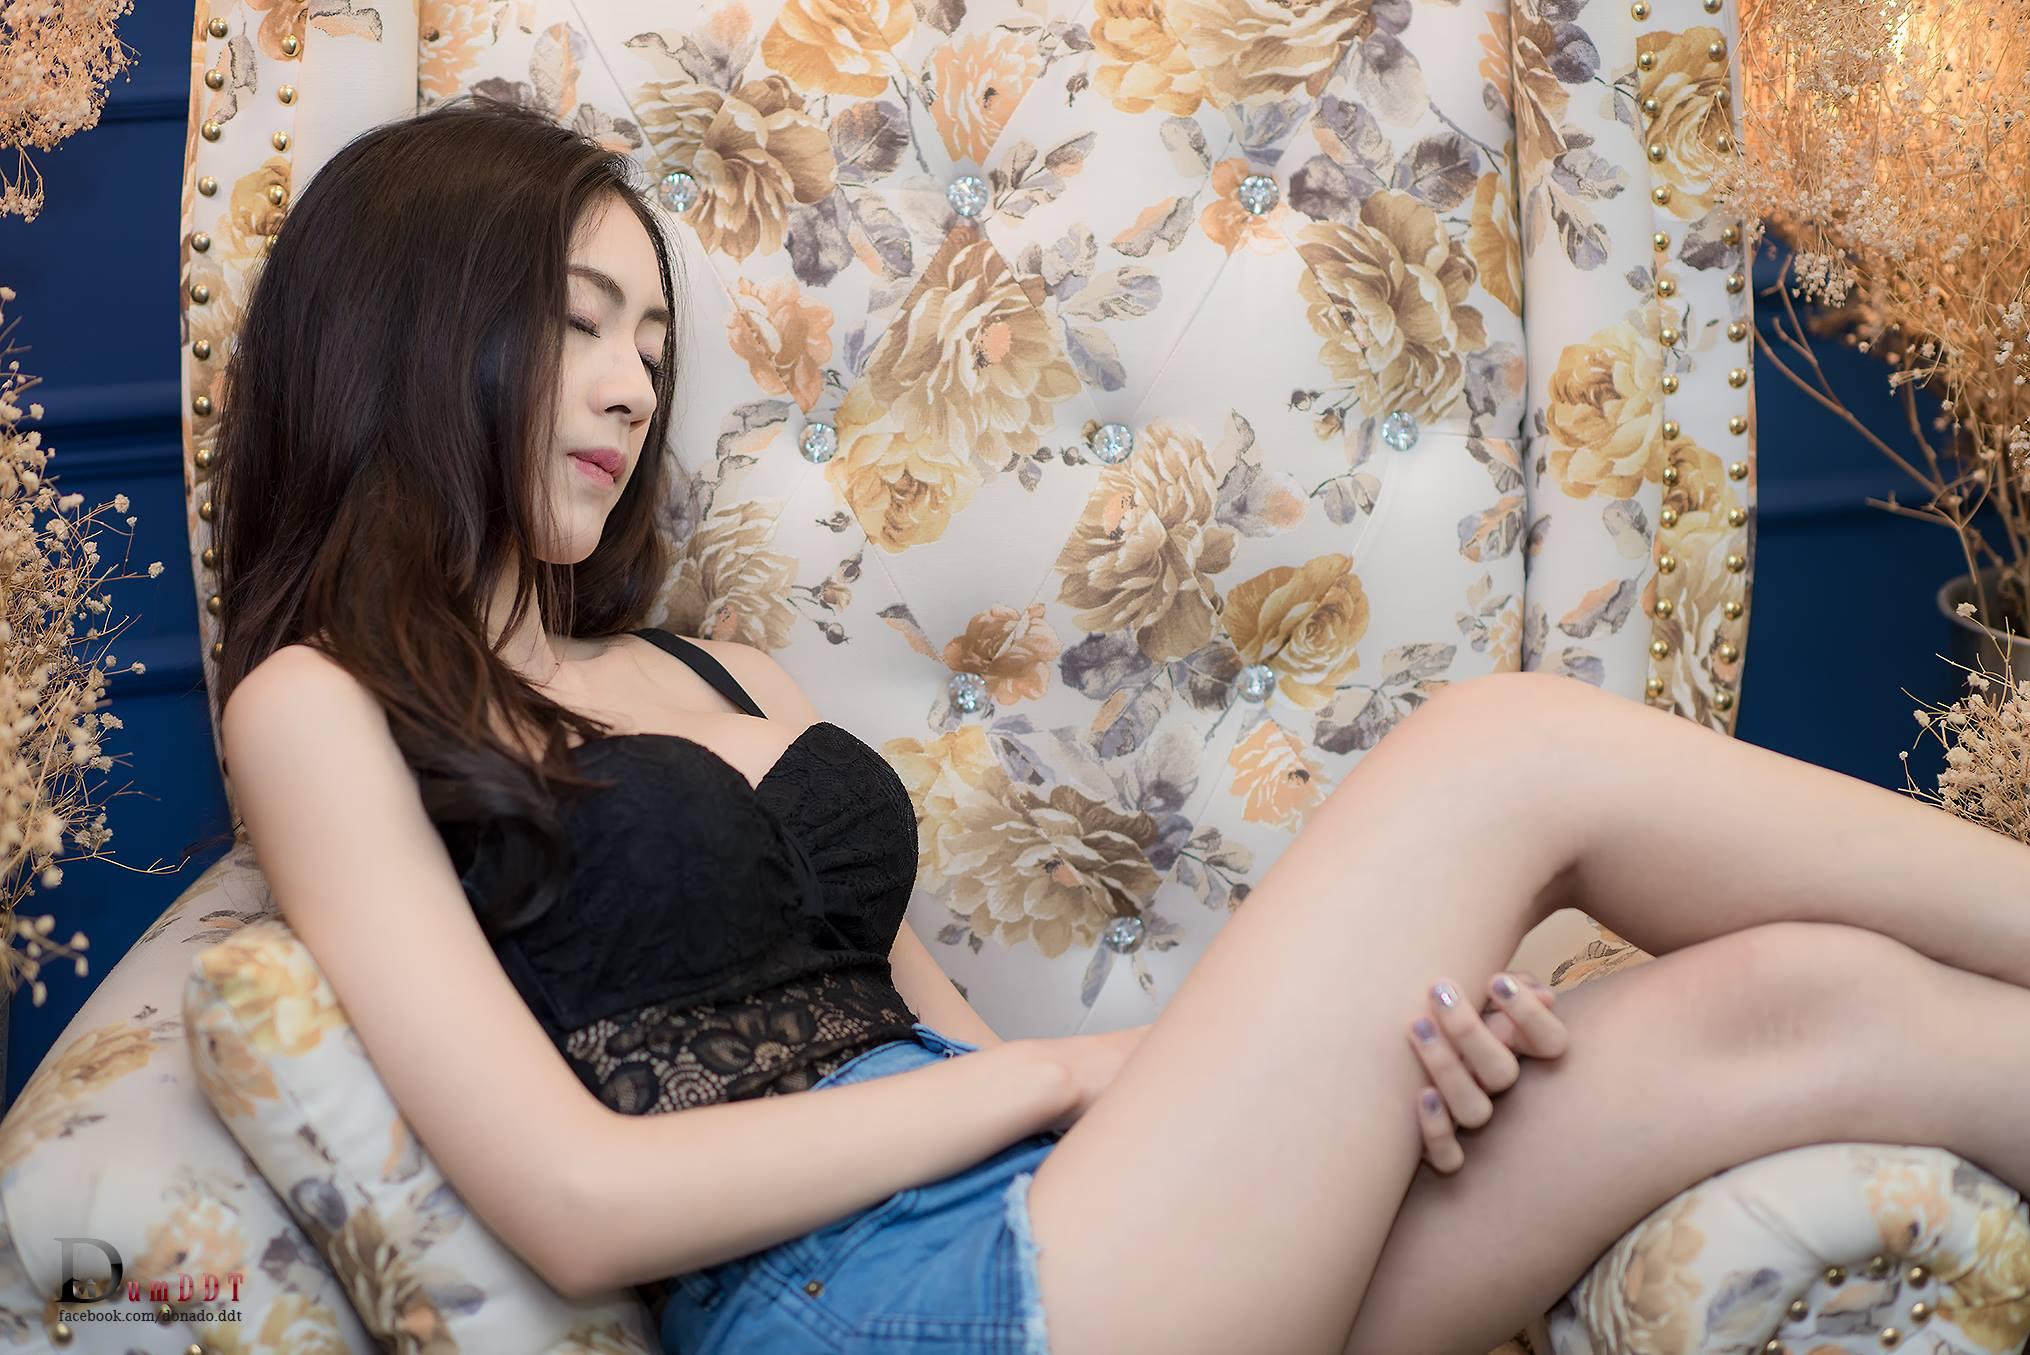 Kimono - Kanchana Mint Ruenpong